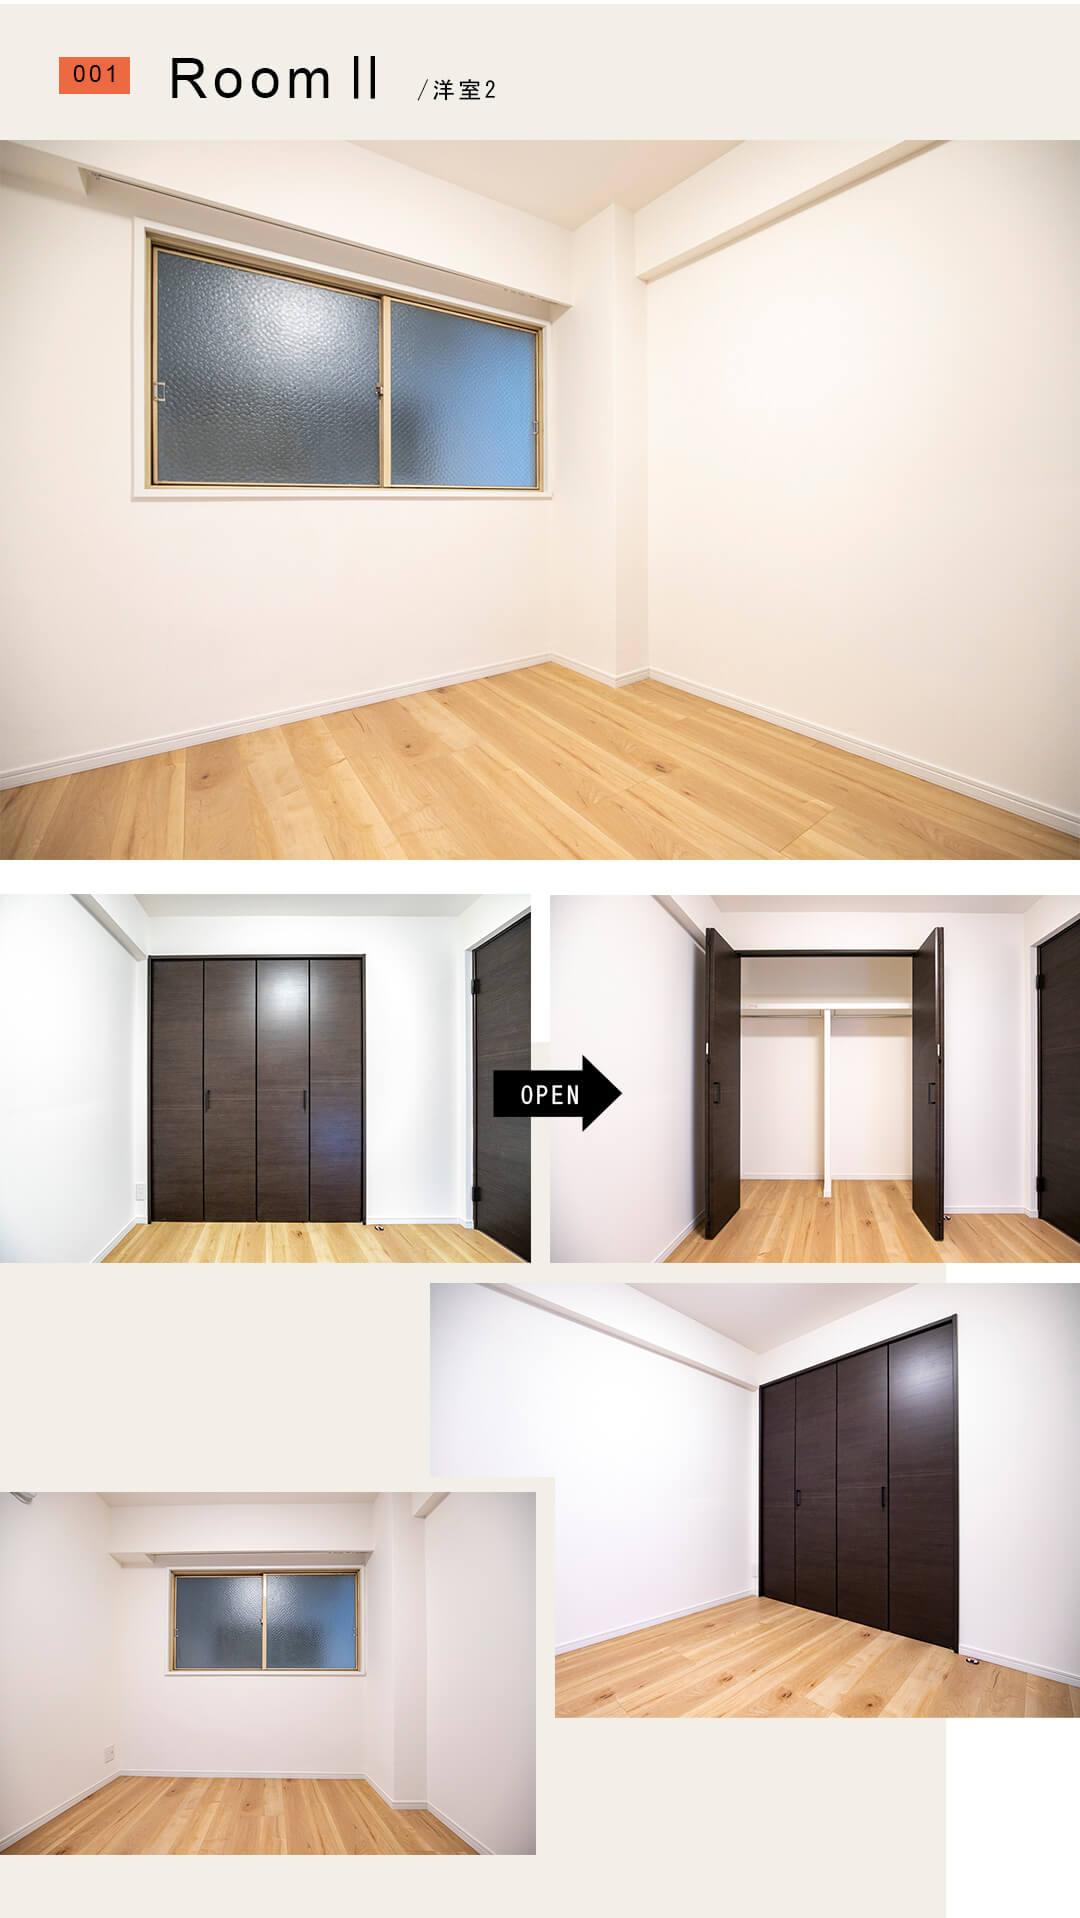 004,RoomⅡ,洋室2